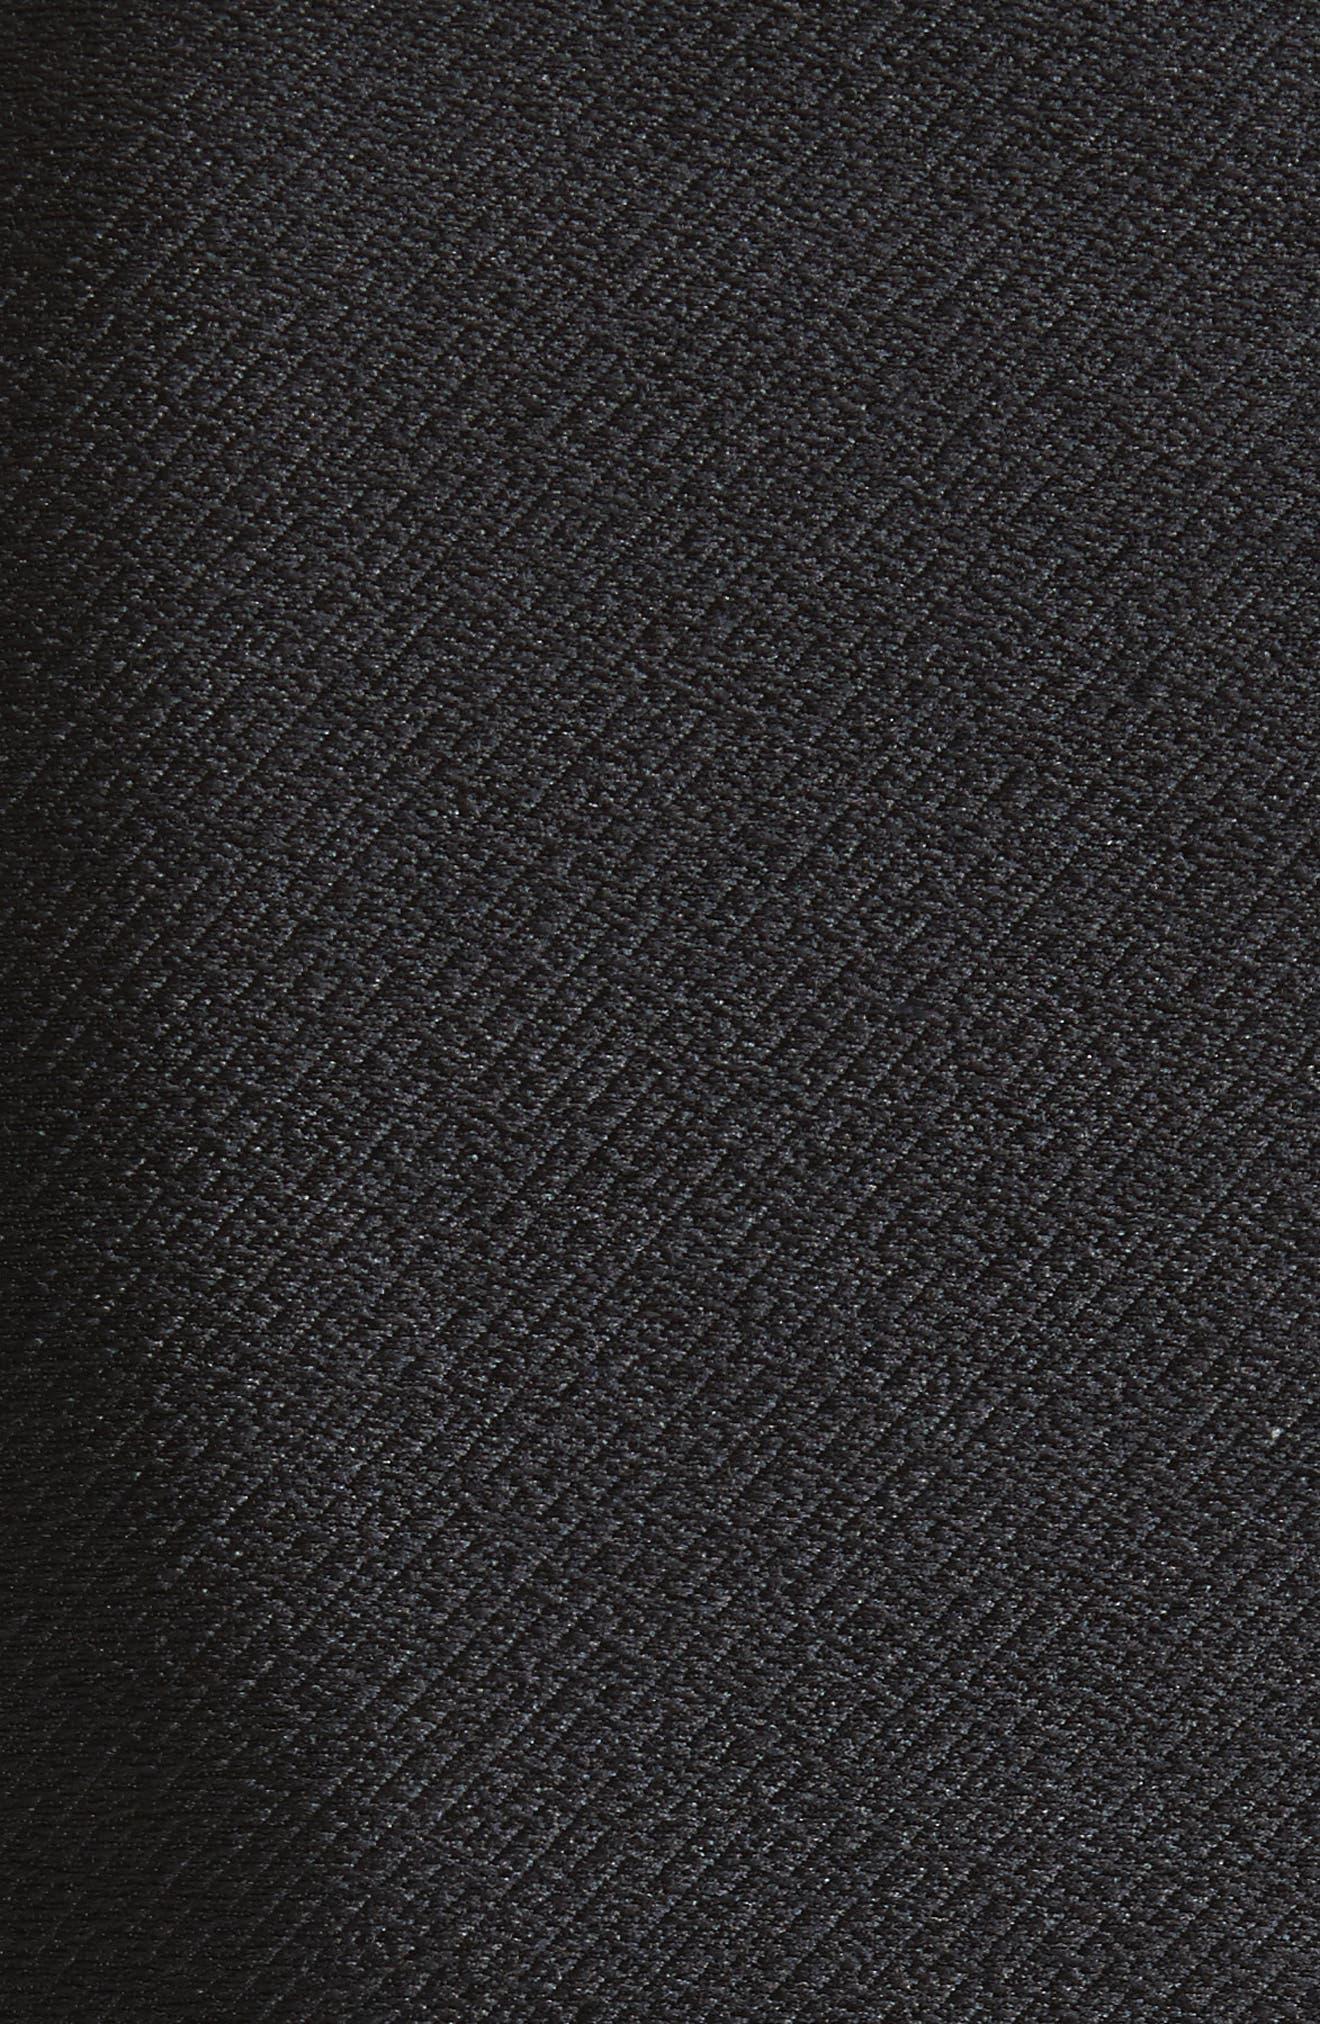 Popover Fit & Flare Dress,                             Alternate thumbnail 5, color,                             001